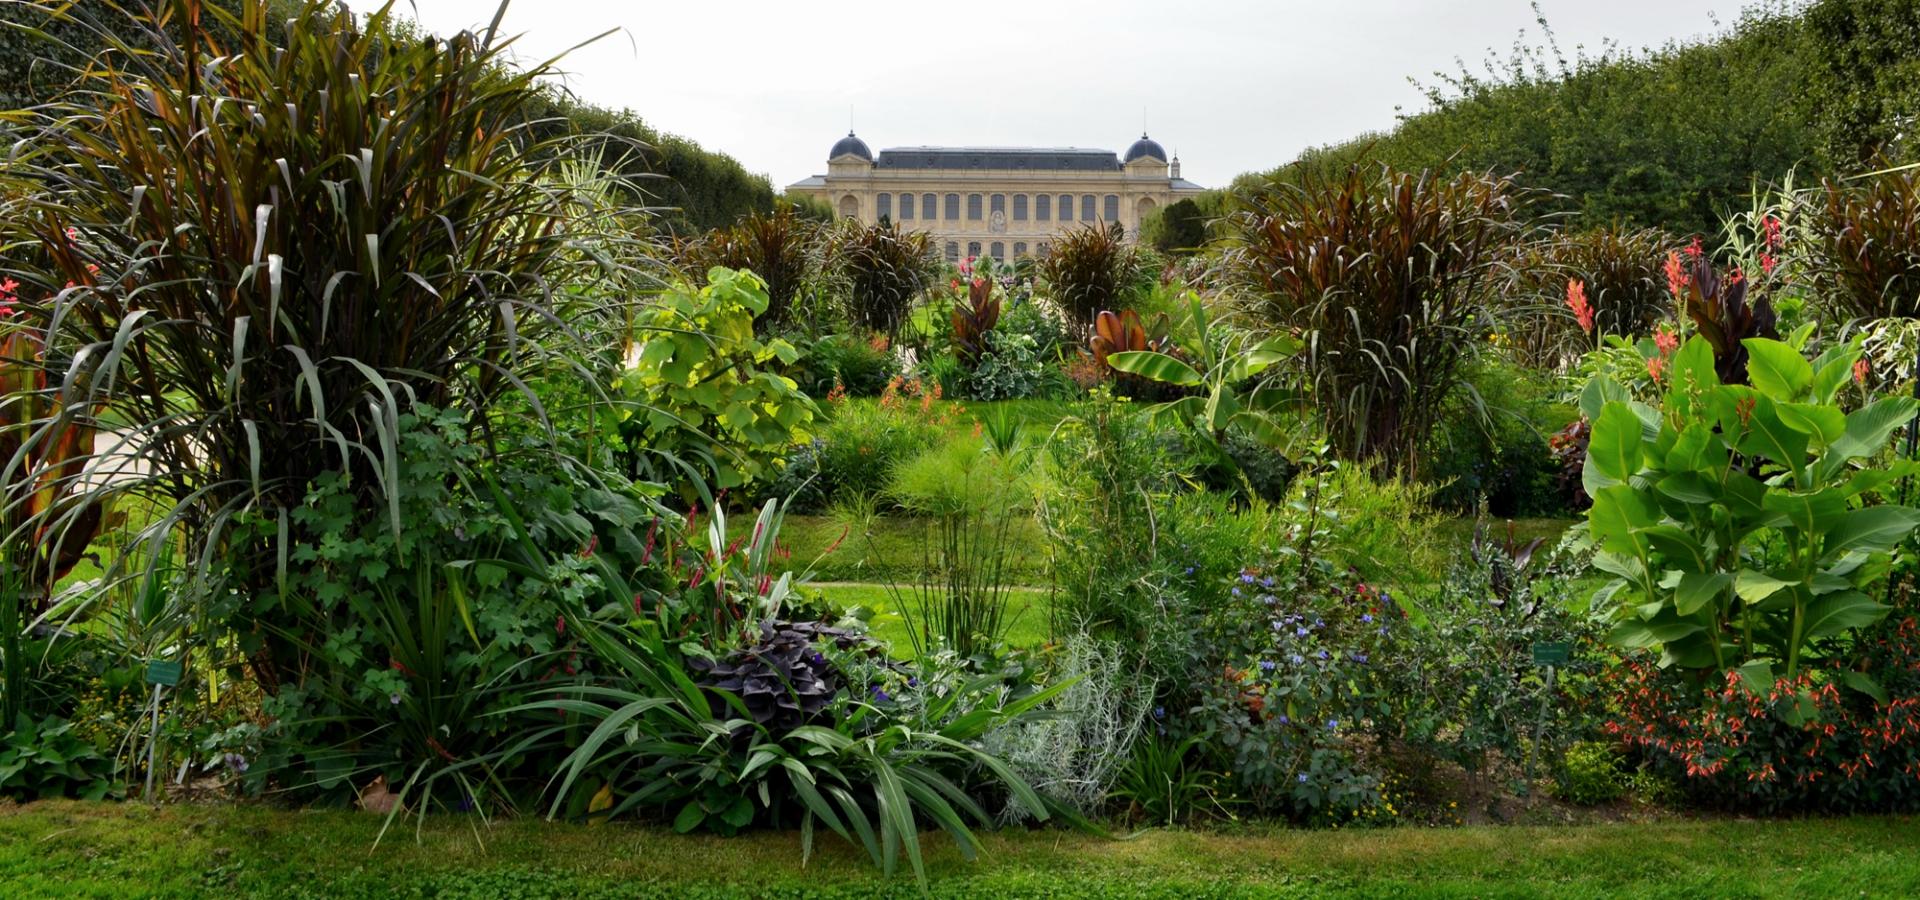 Jardin Galeries Jardins Zoo Plantes Des rqYUAHr